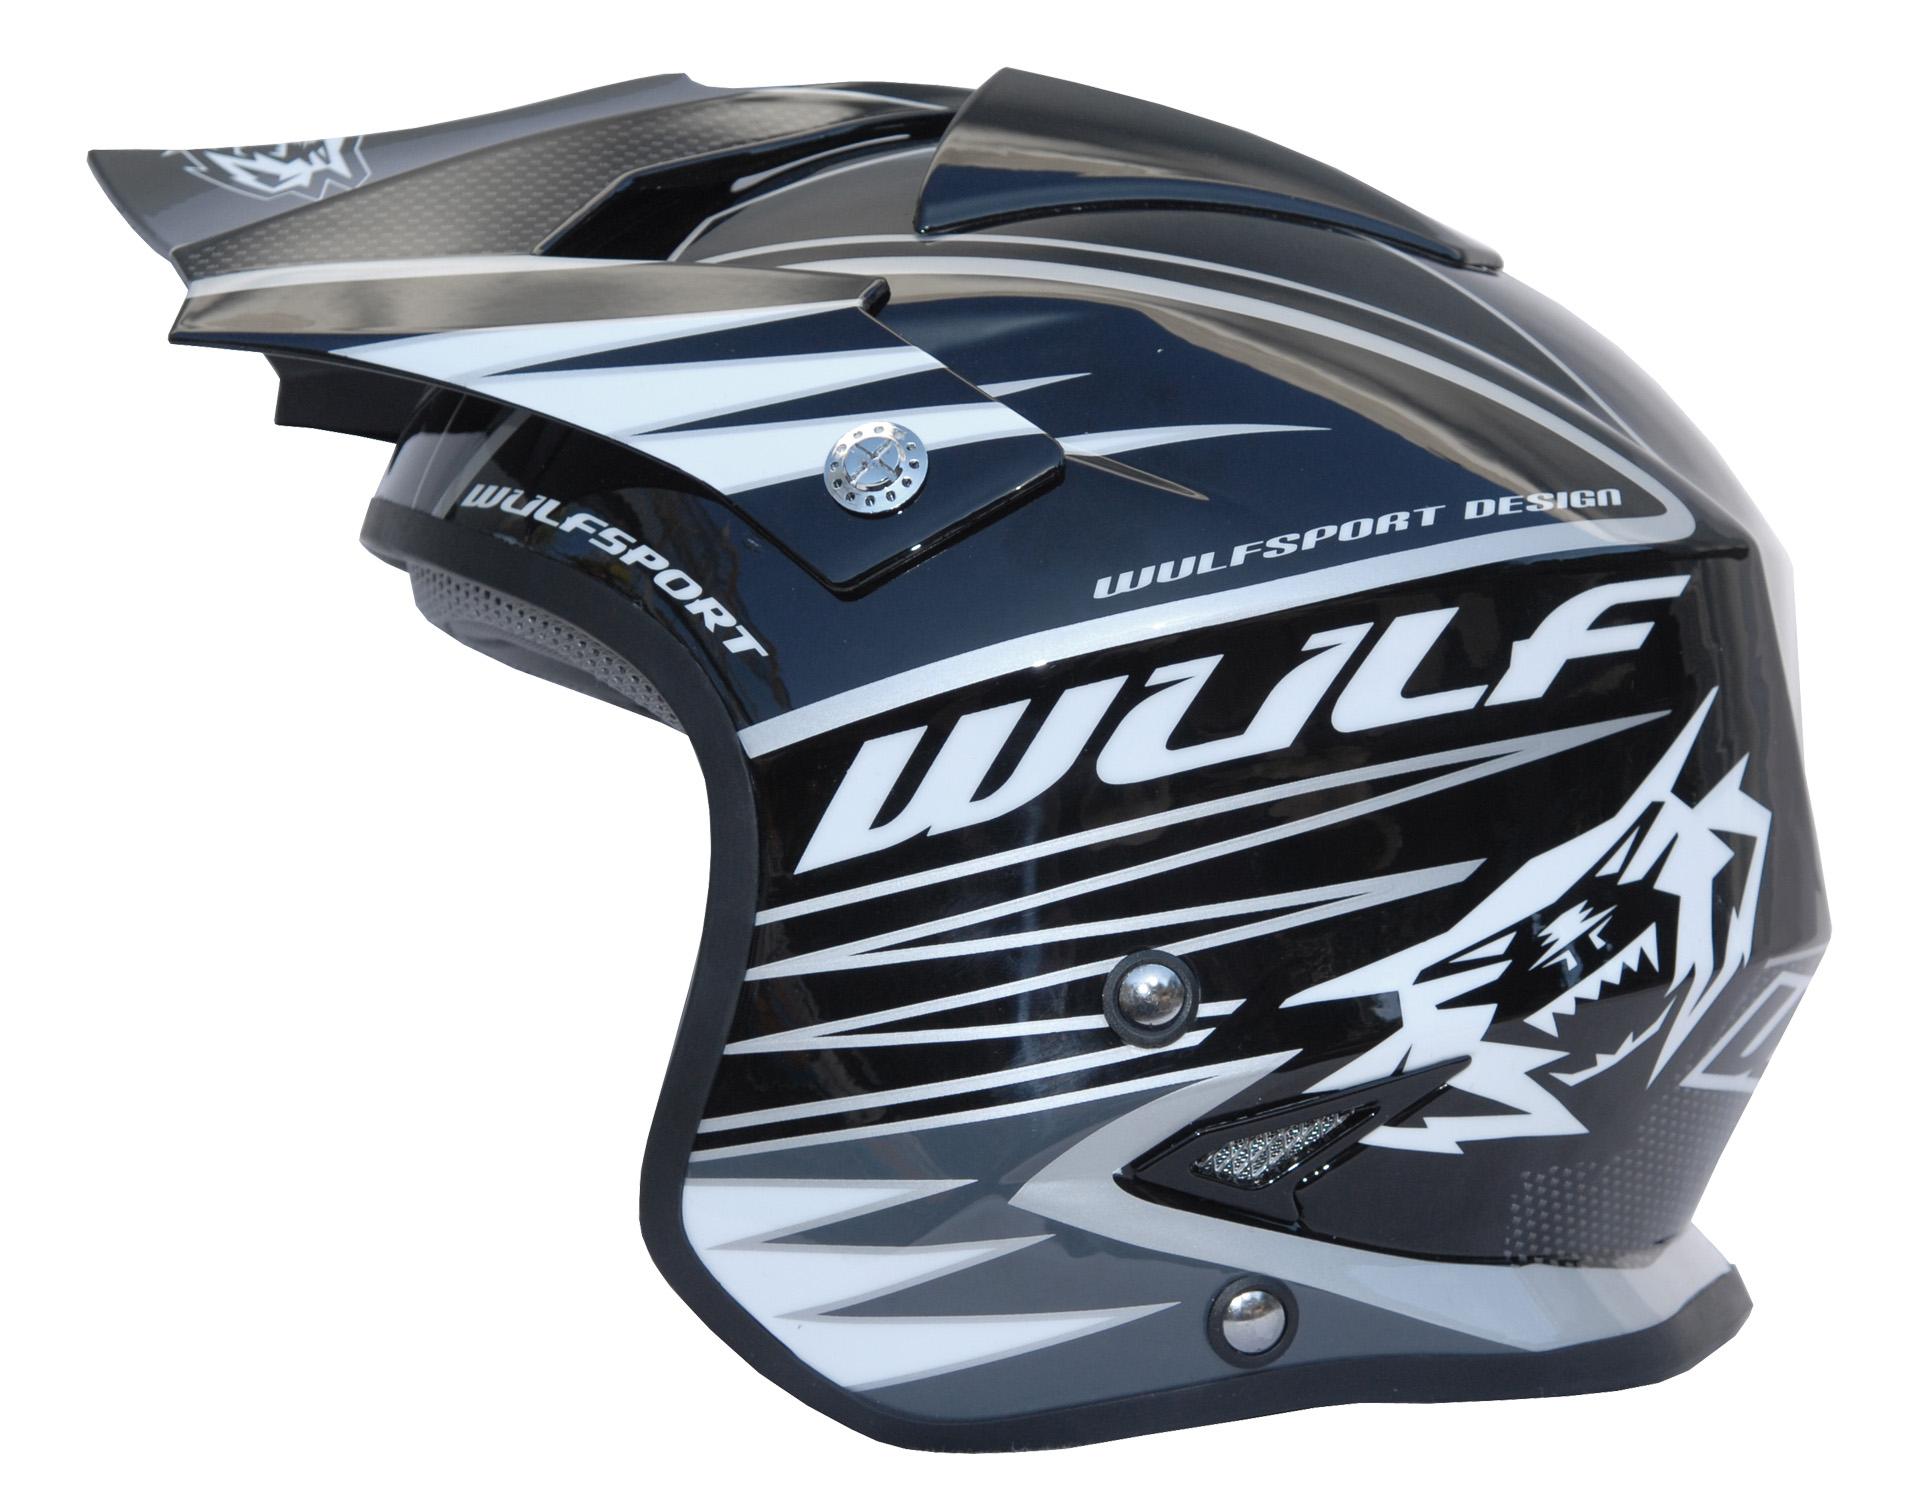 Wulfsport Wulf Tri Action Trials Helmet Black